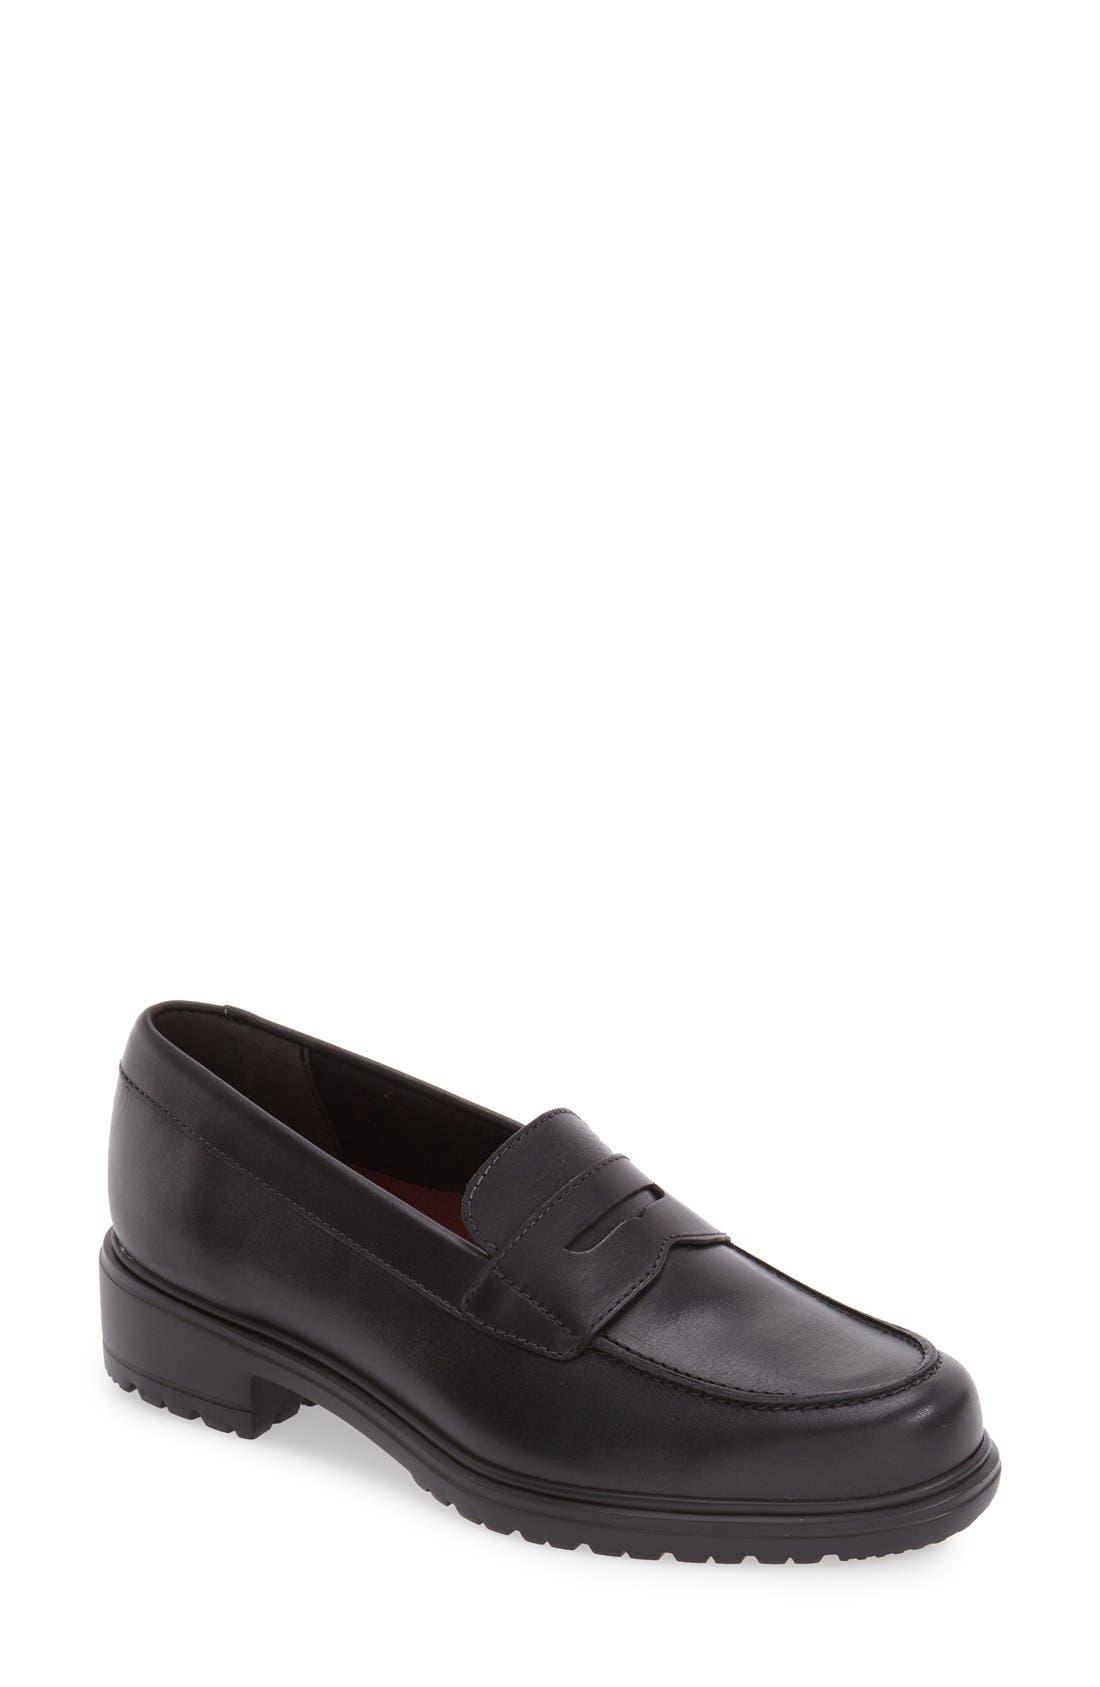 Munro 'Jordi' Leather Loafer (Women)